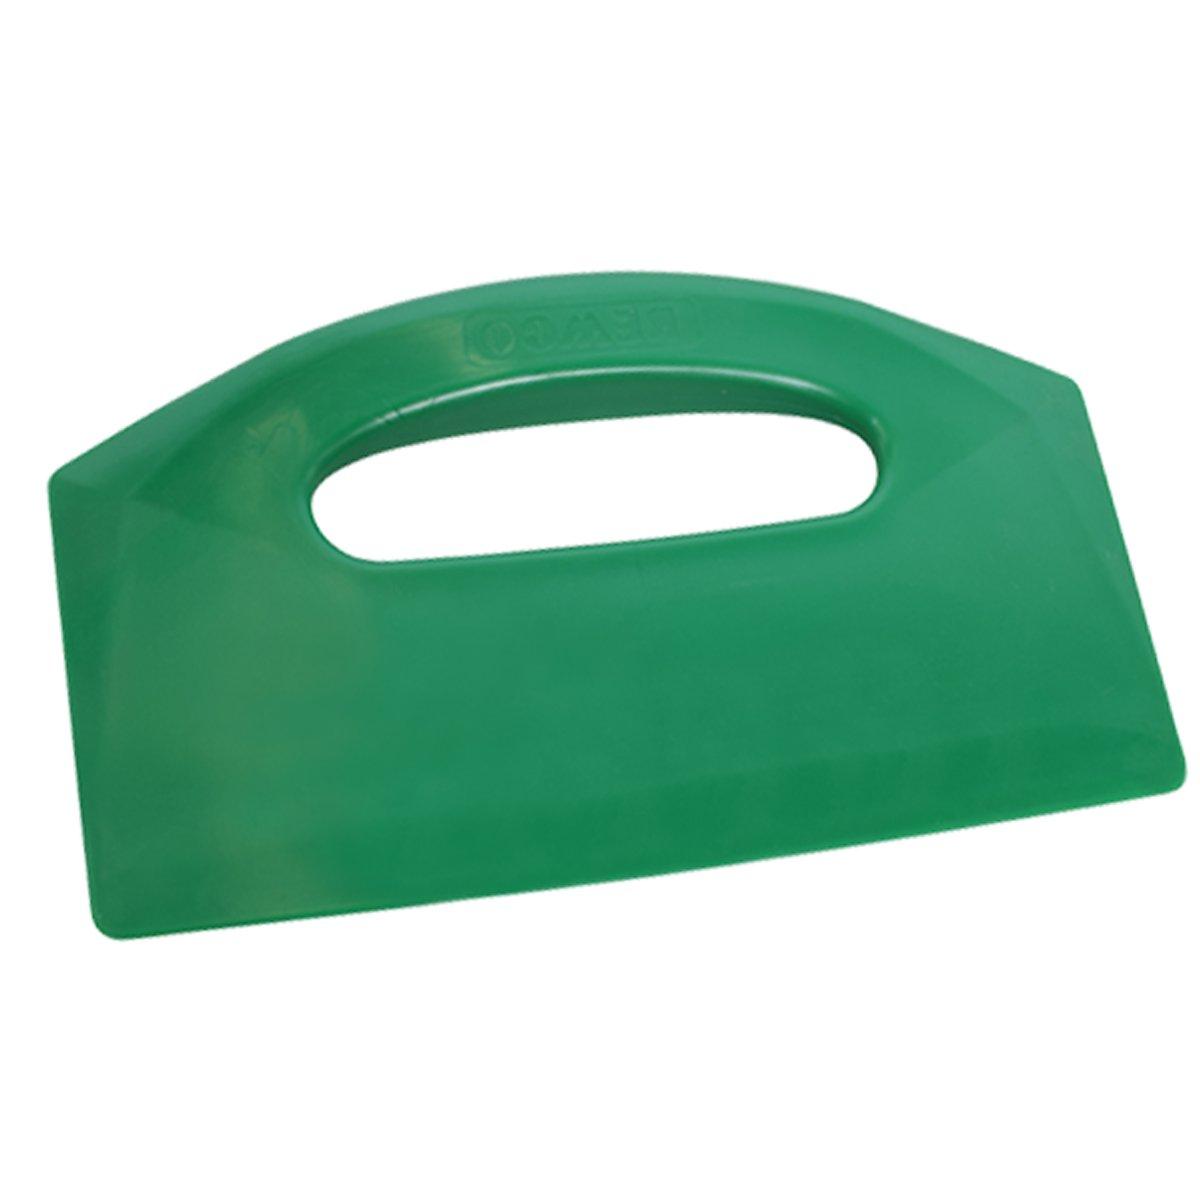 UltraSource Bowl/Bench Scraper, Green, 8.5